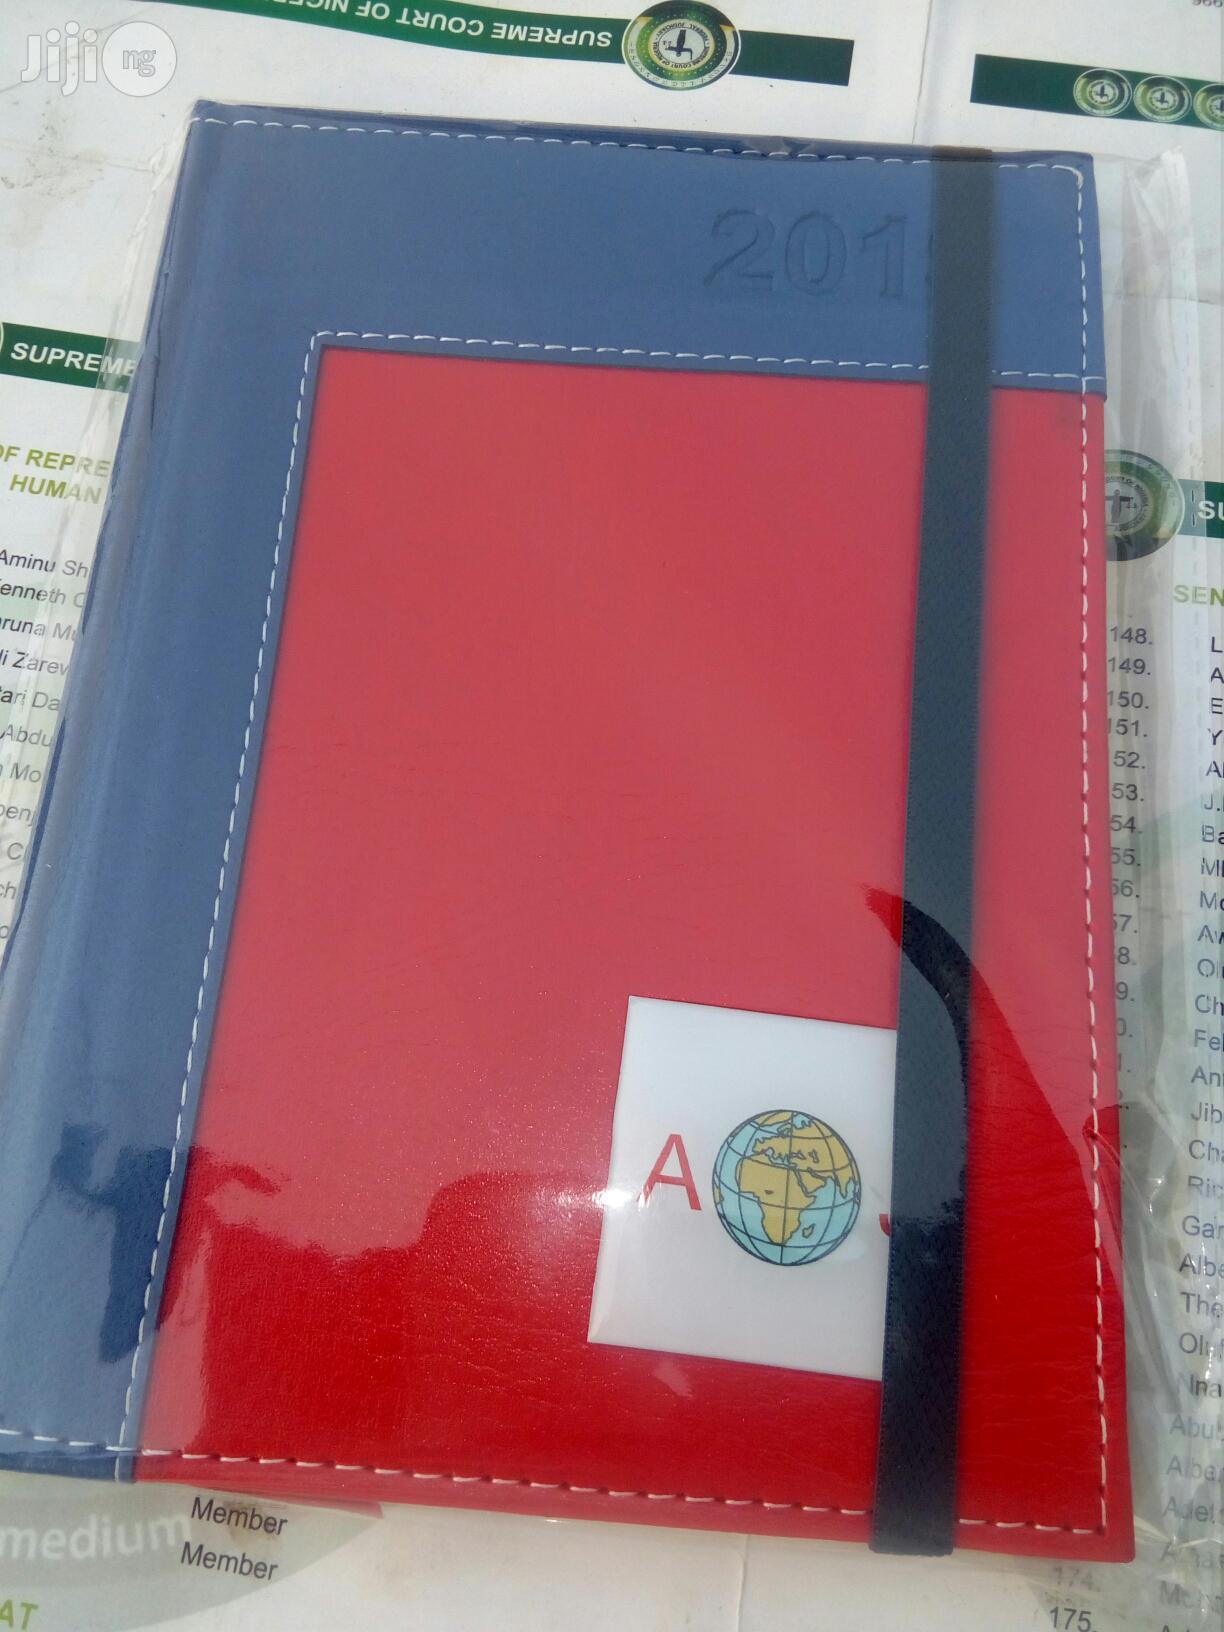 Trainings, Diaries, Uniforms, Monogram, Souvenirs And Printing